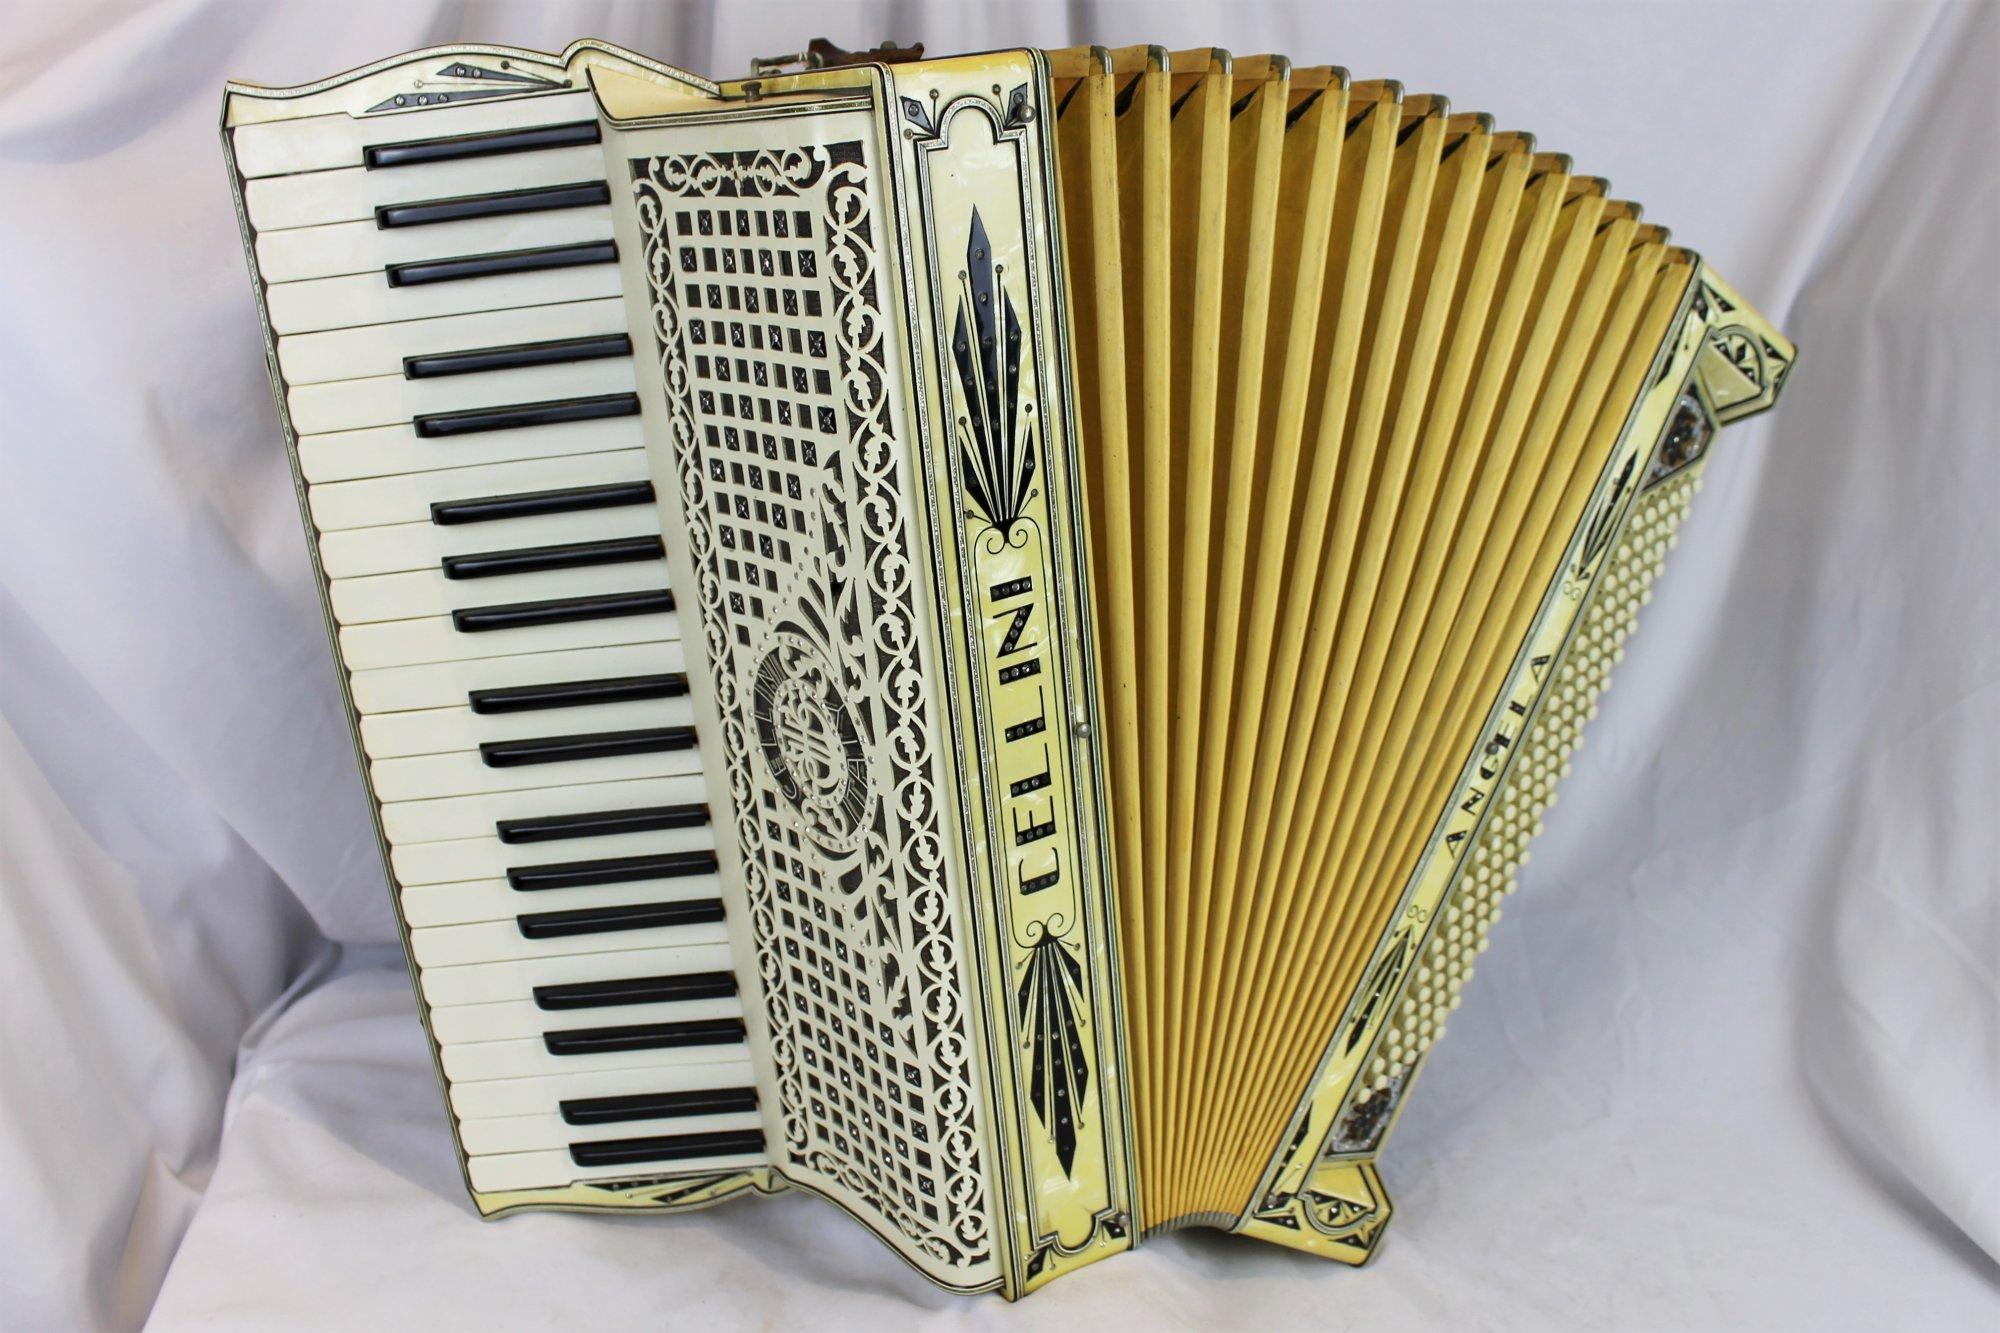 4375 - Ivory Cellini Angela Piano Accordion LMM 41 120